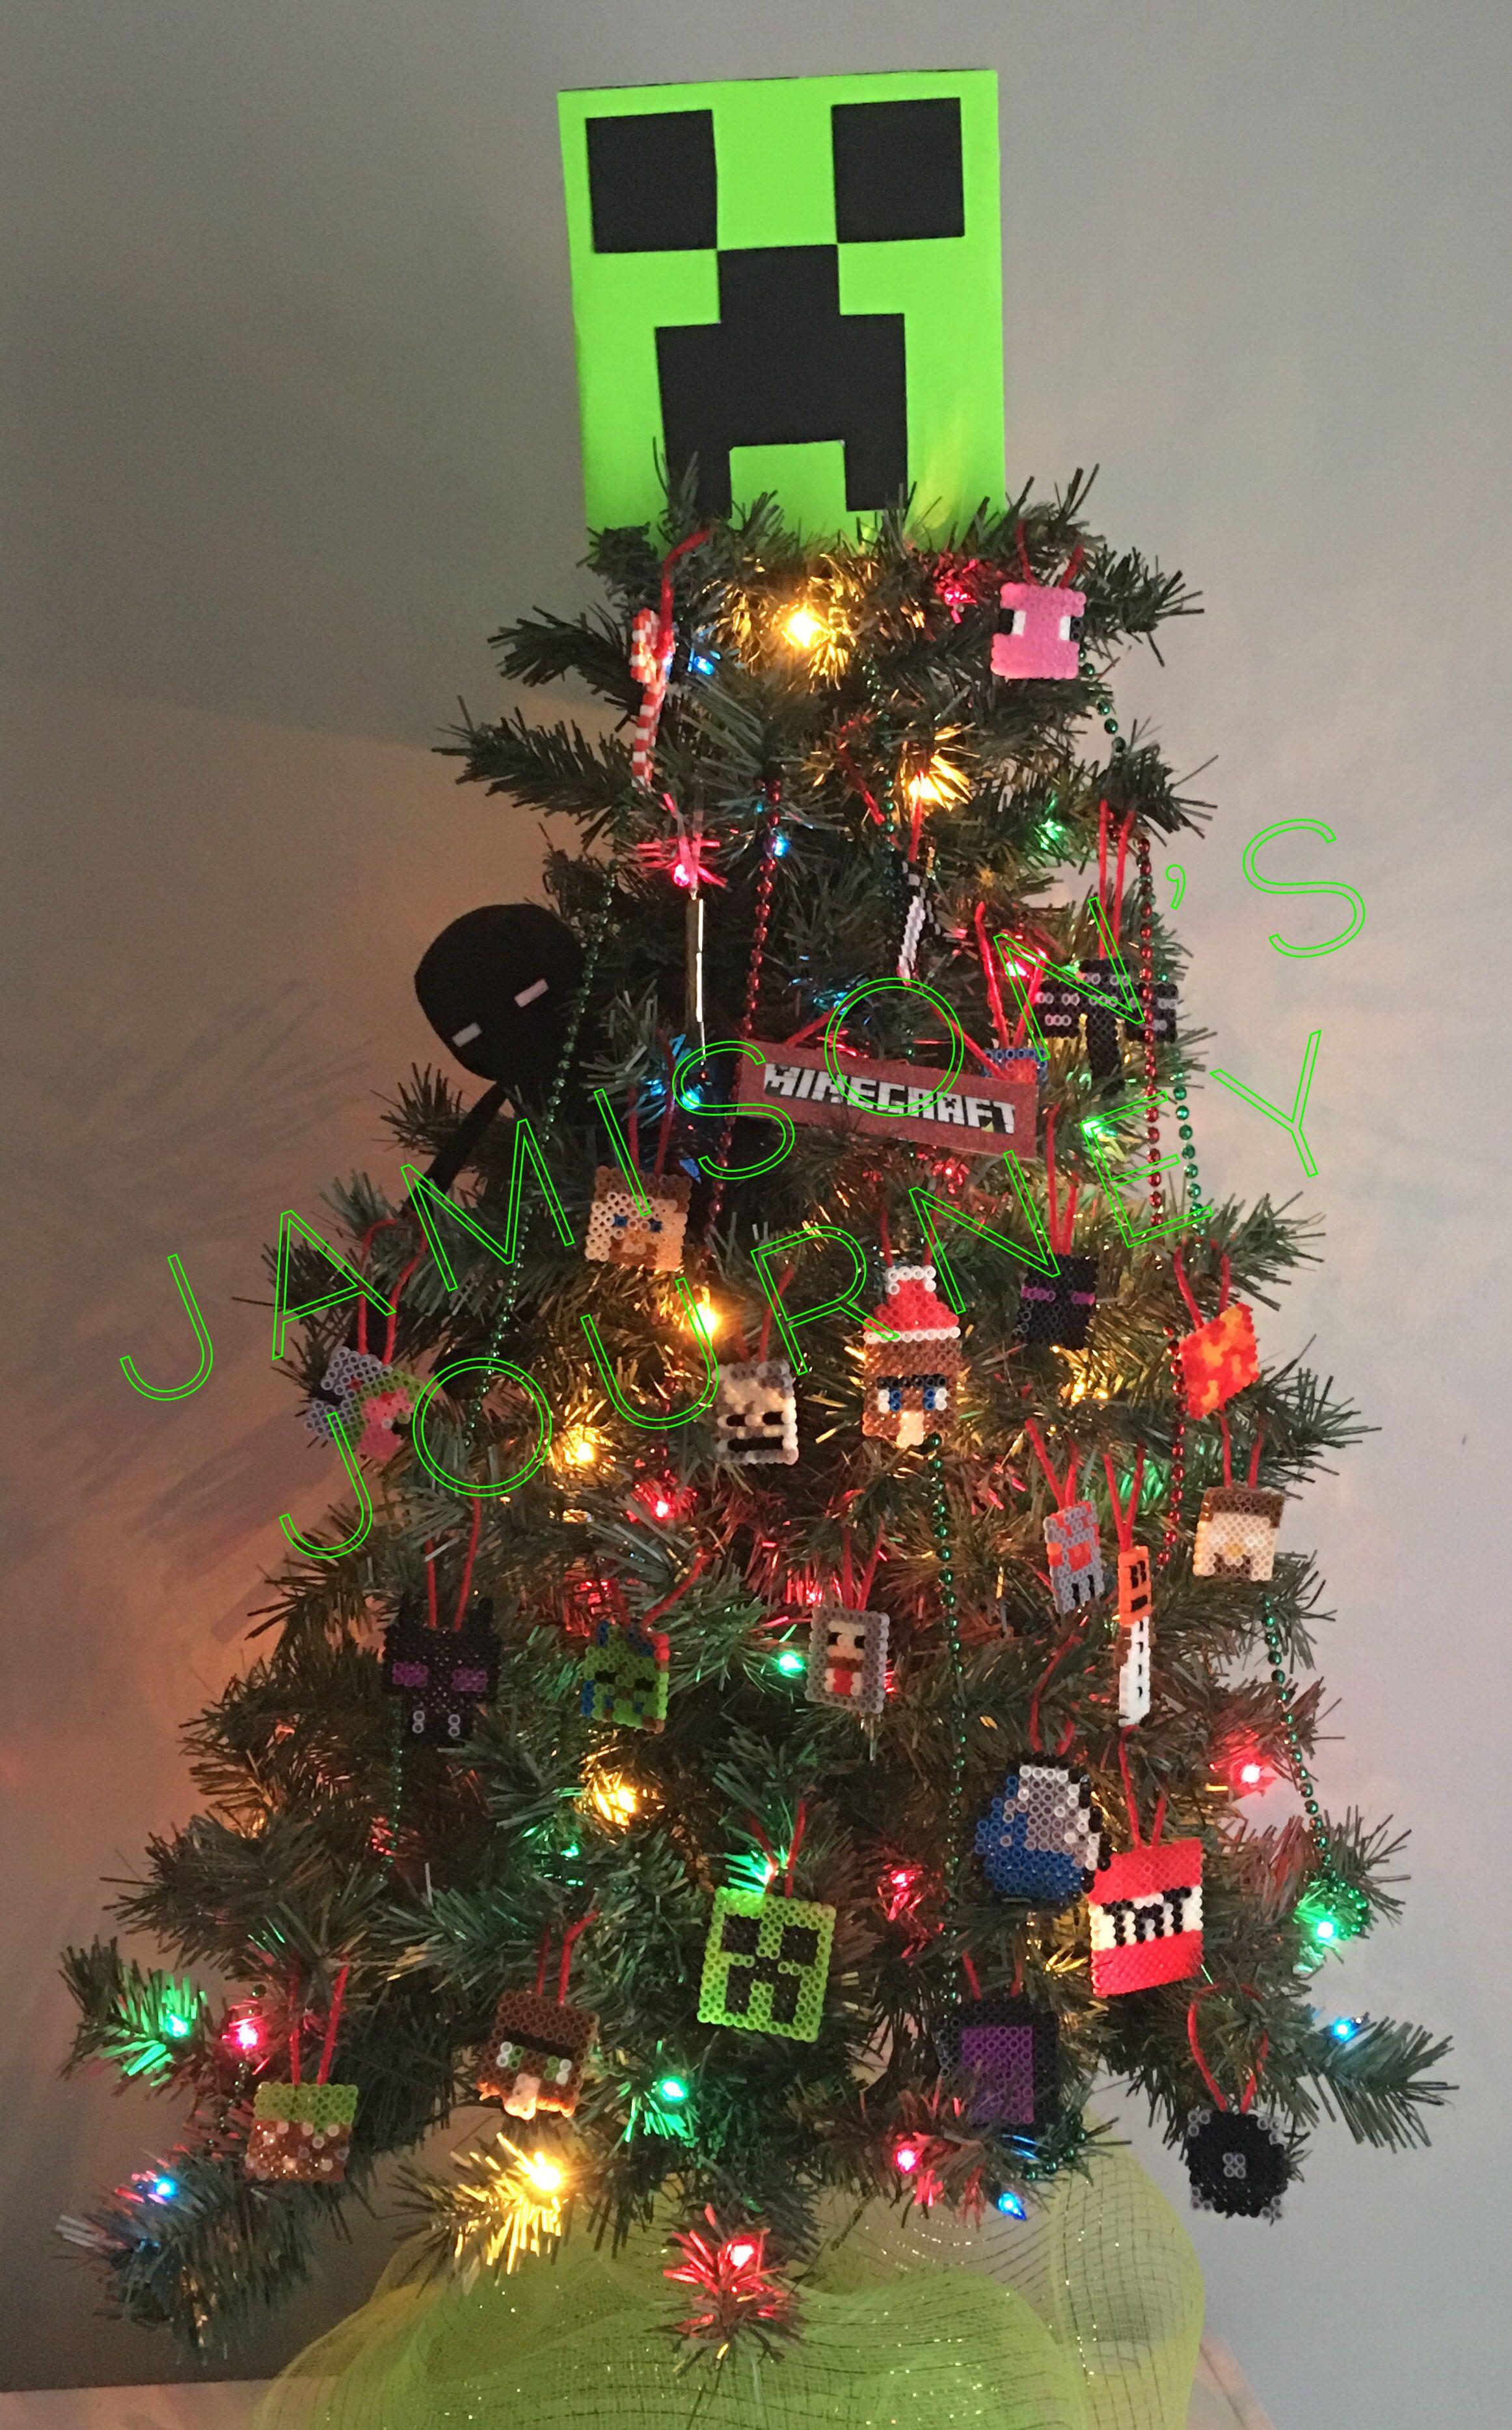 Minecraft Themed Christmas Tree Christmas Tree Themes Christmas Tree Christmas